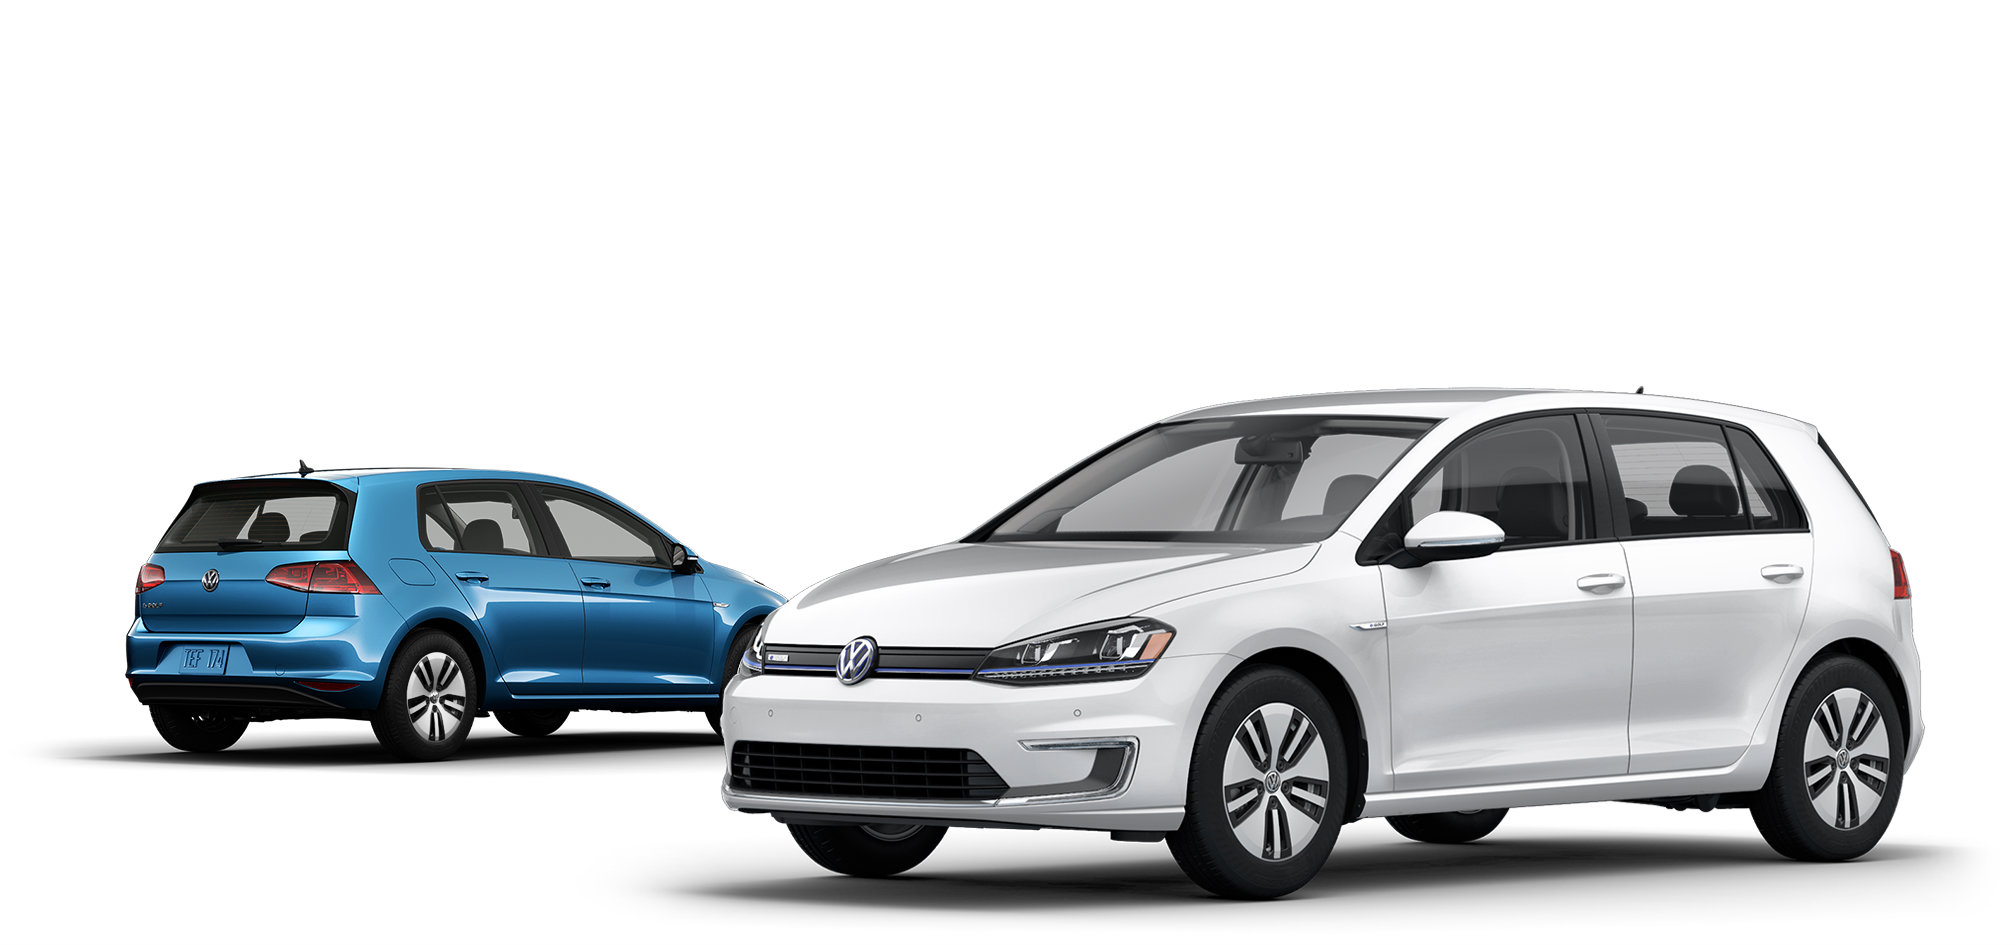 Volkswagen Recalls E Golf Over Software Problem